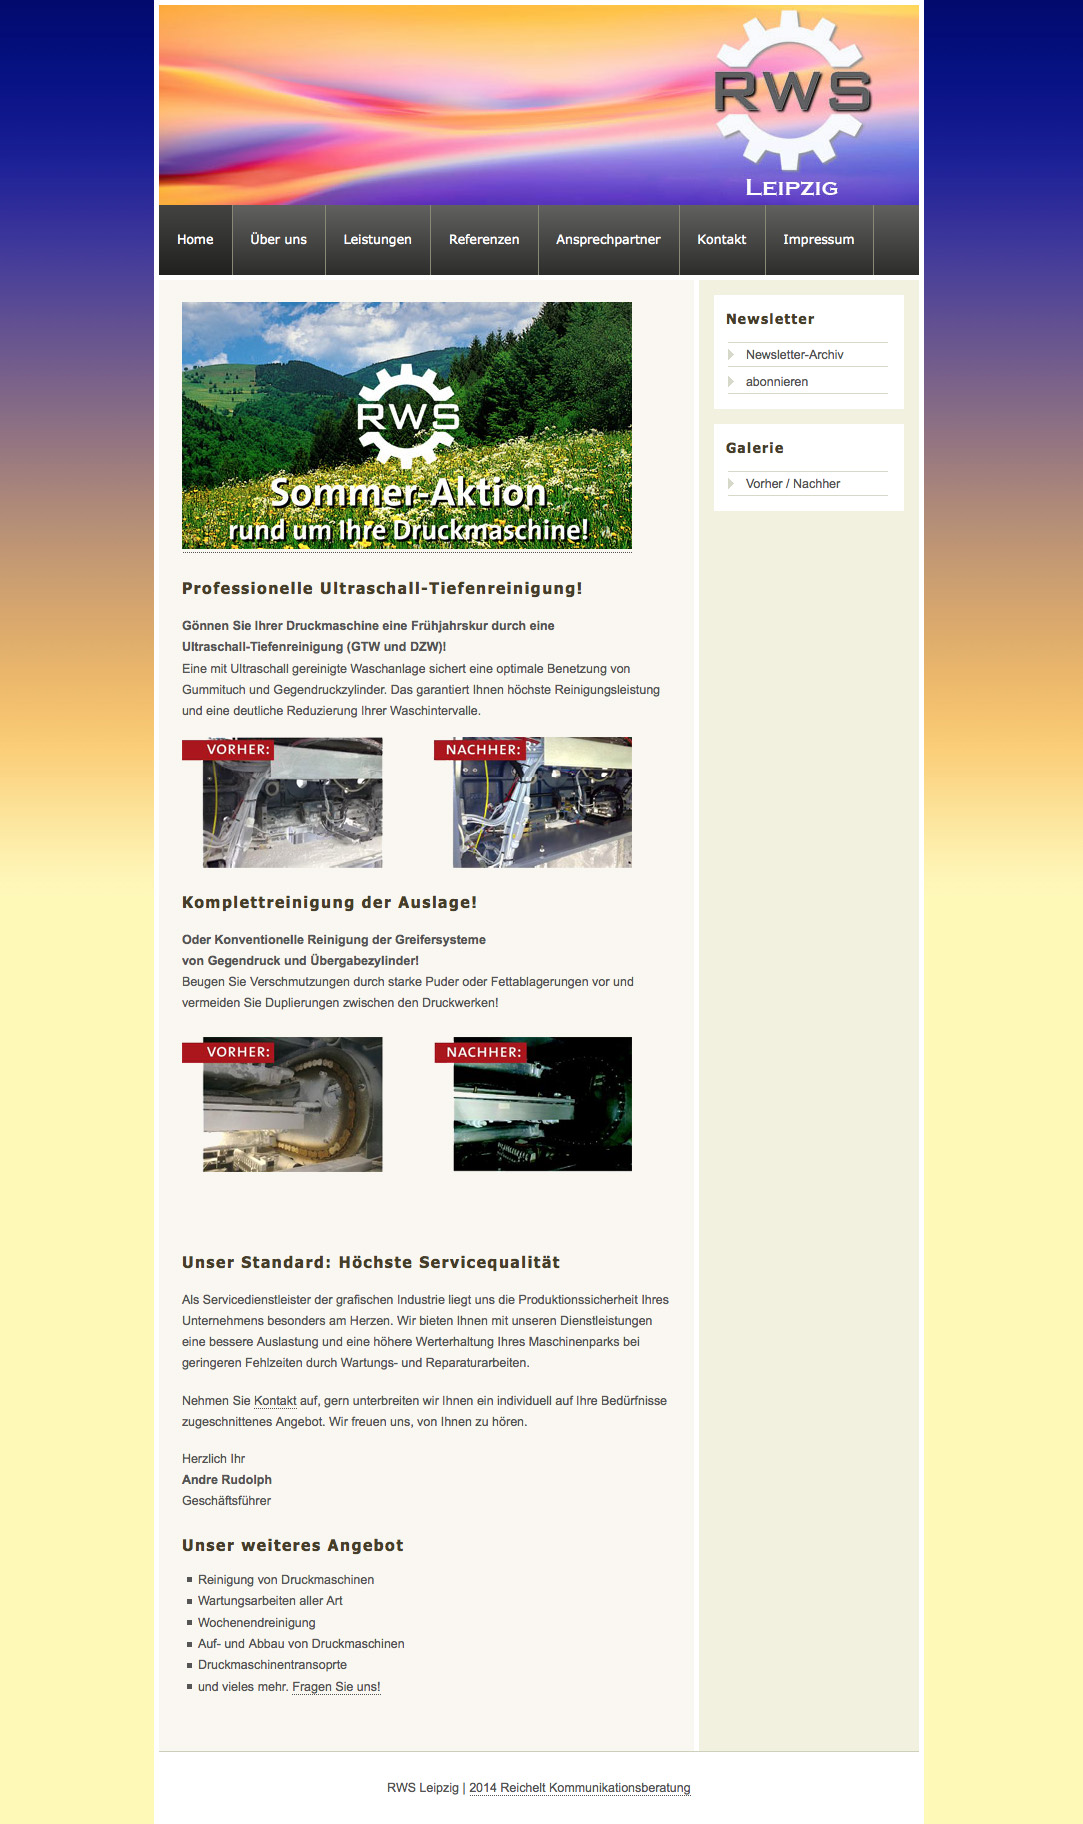 RWS Leipzig Internetauftritt